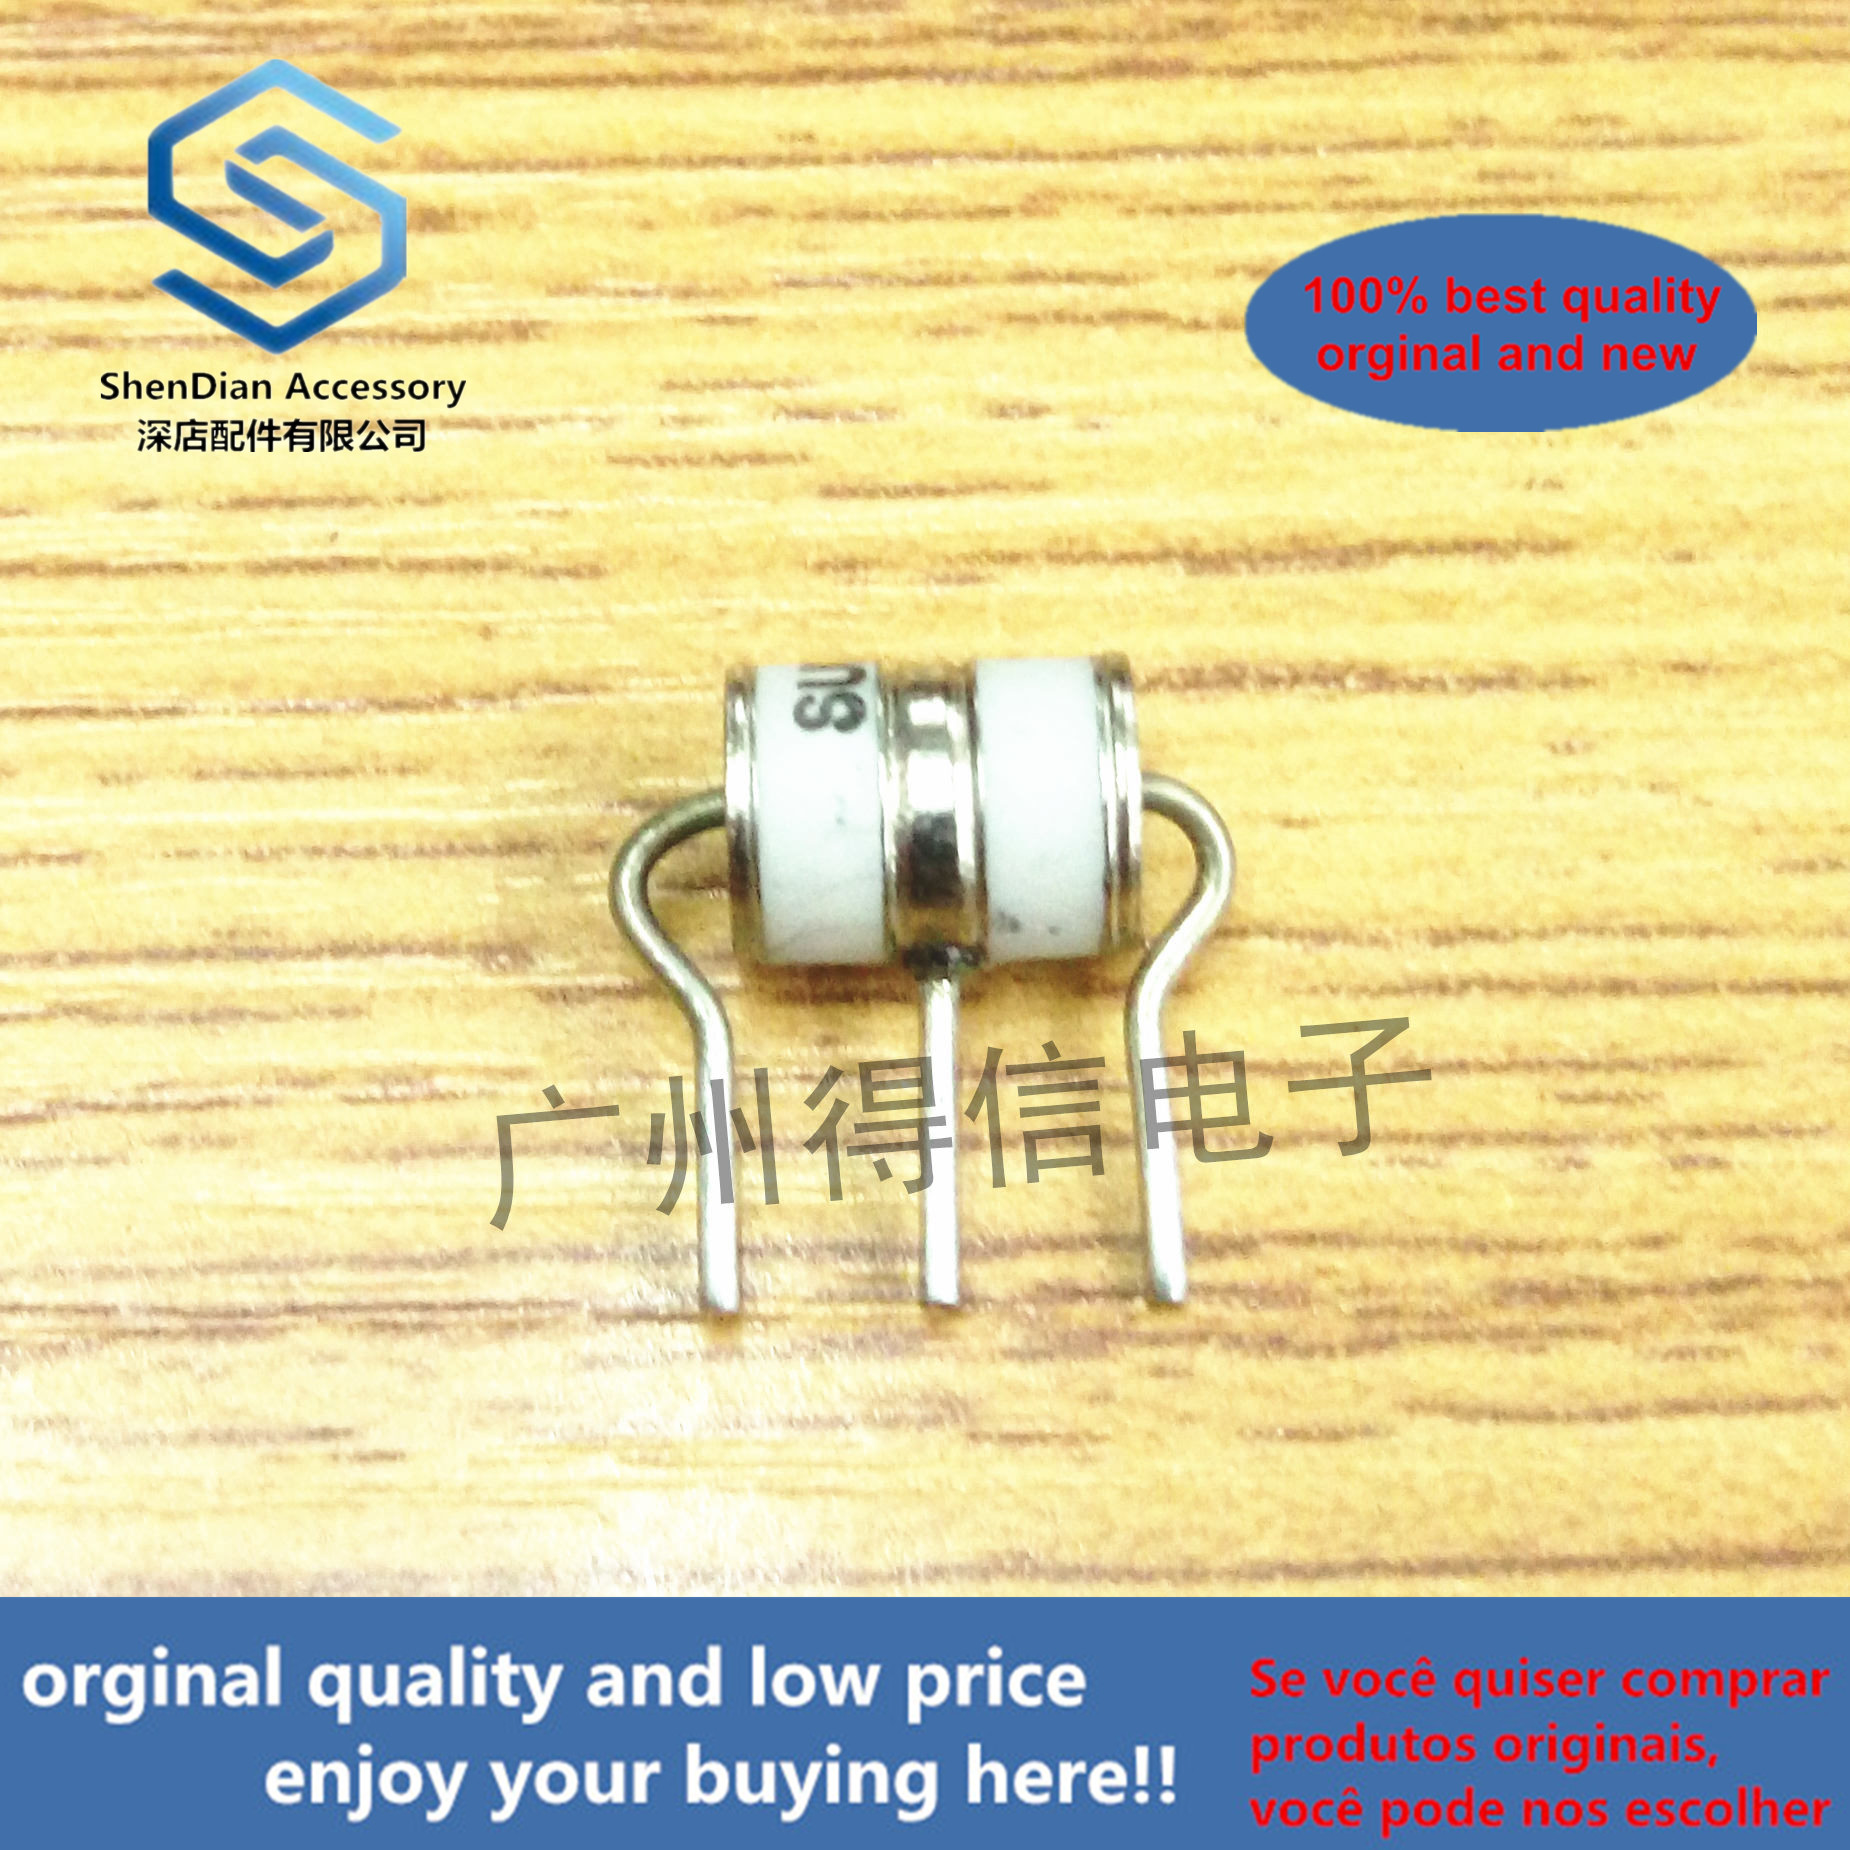 10pcs 100% Orginal NewSE33-150X 3R150 150V 6x8 Ceramic Gas Lightning Arrester Discharge Tube  Real Photo